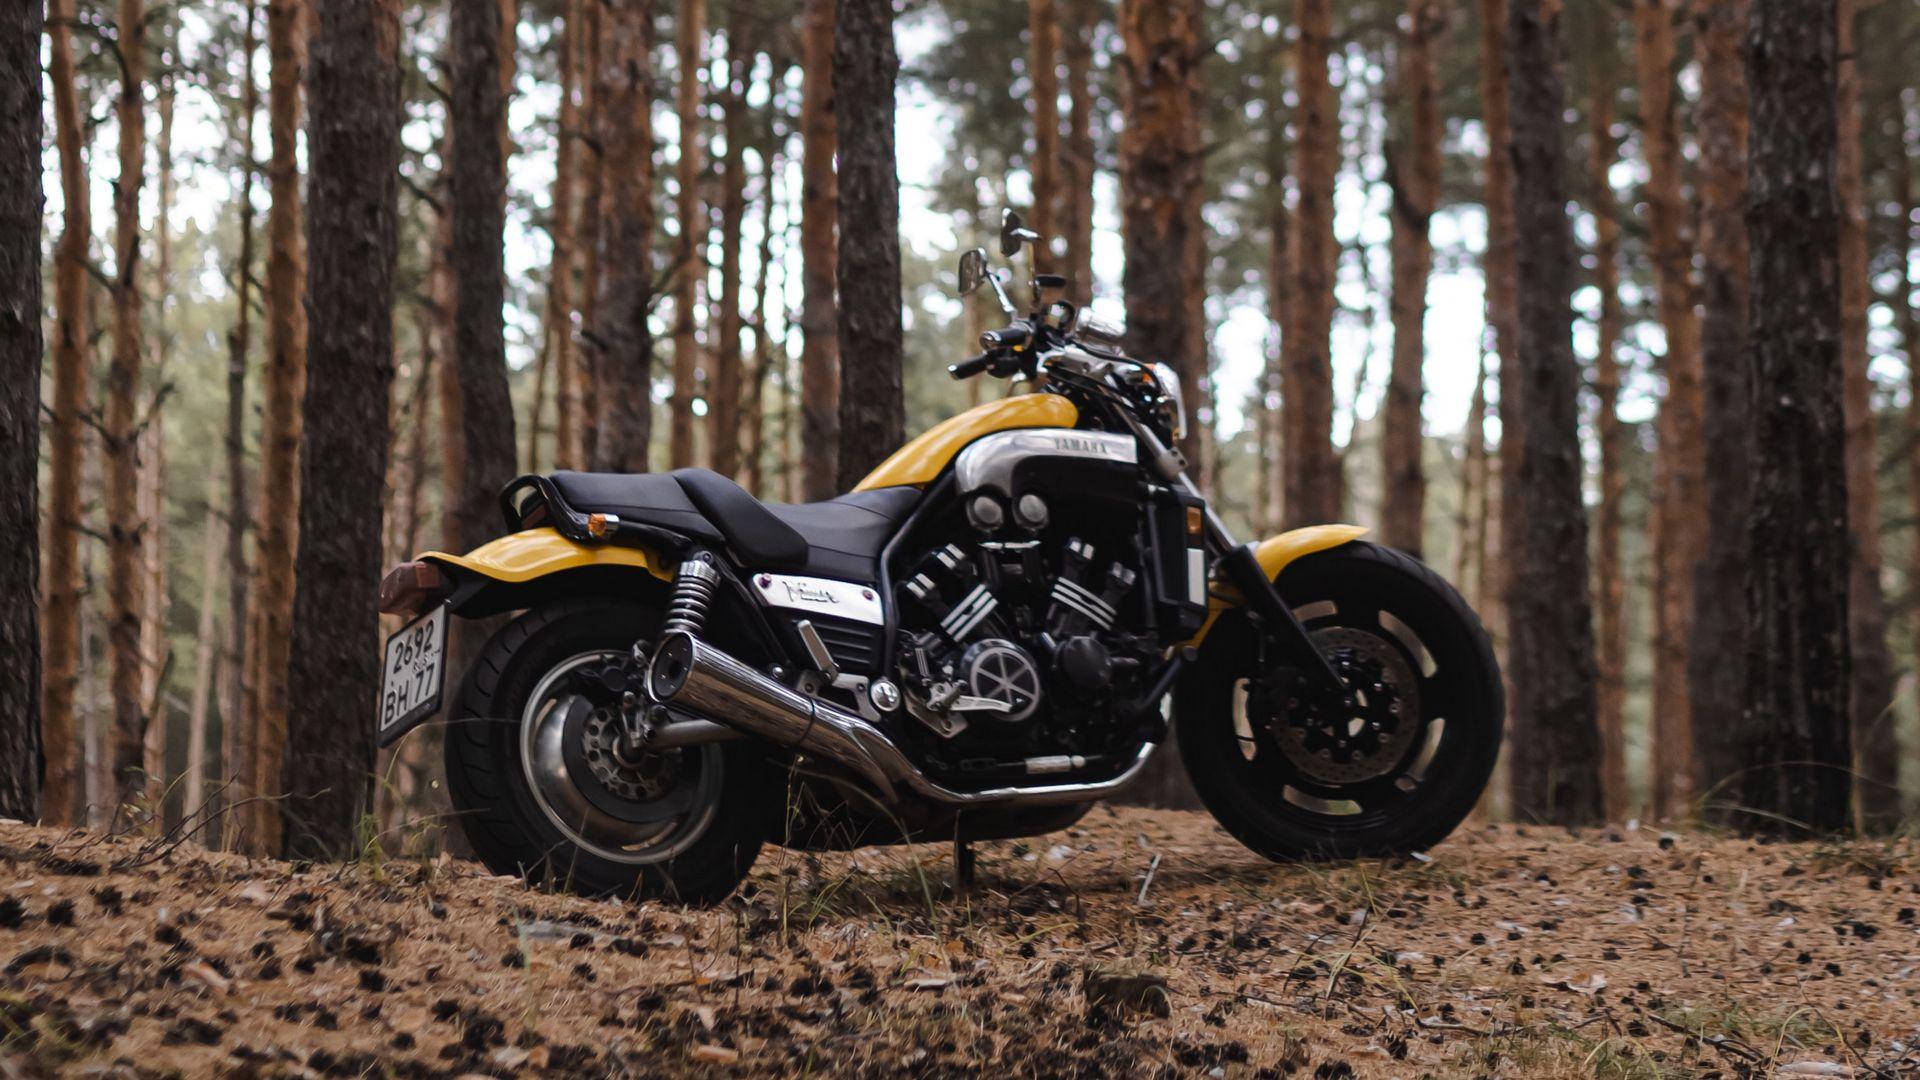 Yamaha, Bike, Motorcycle Wallpapers Free Download (2)